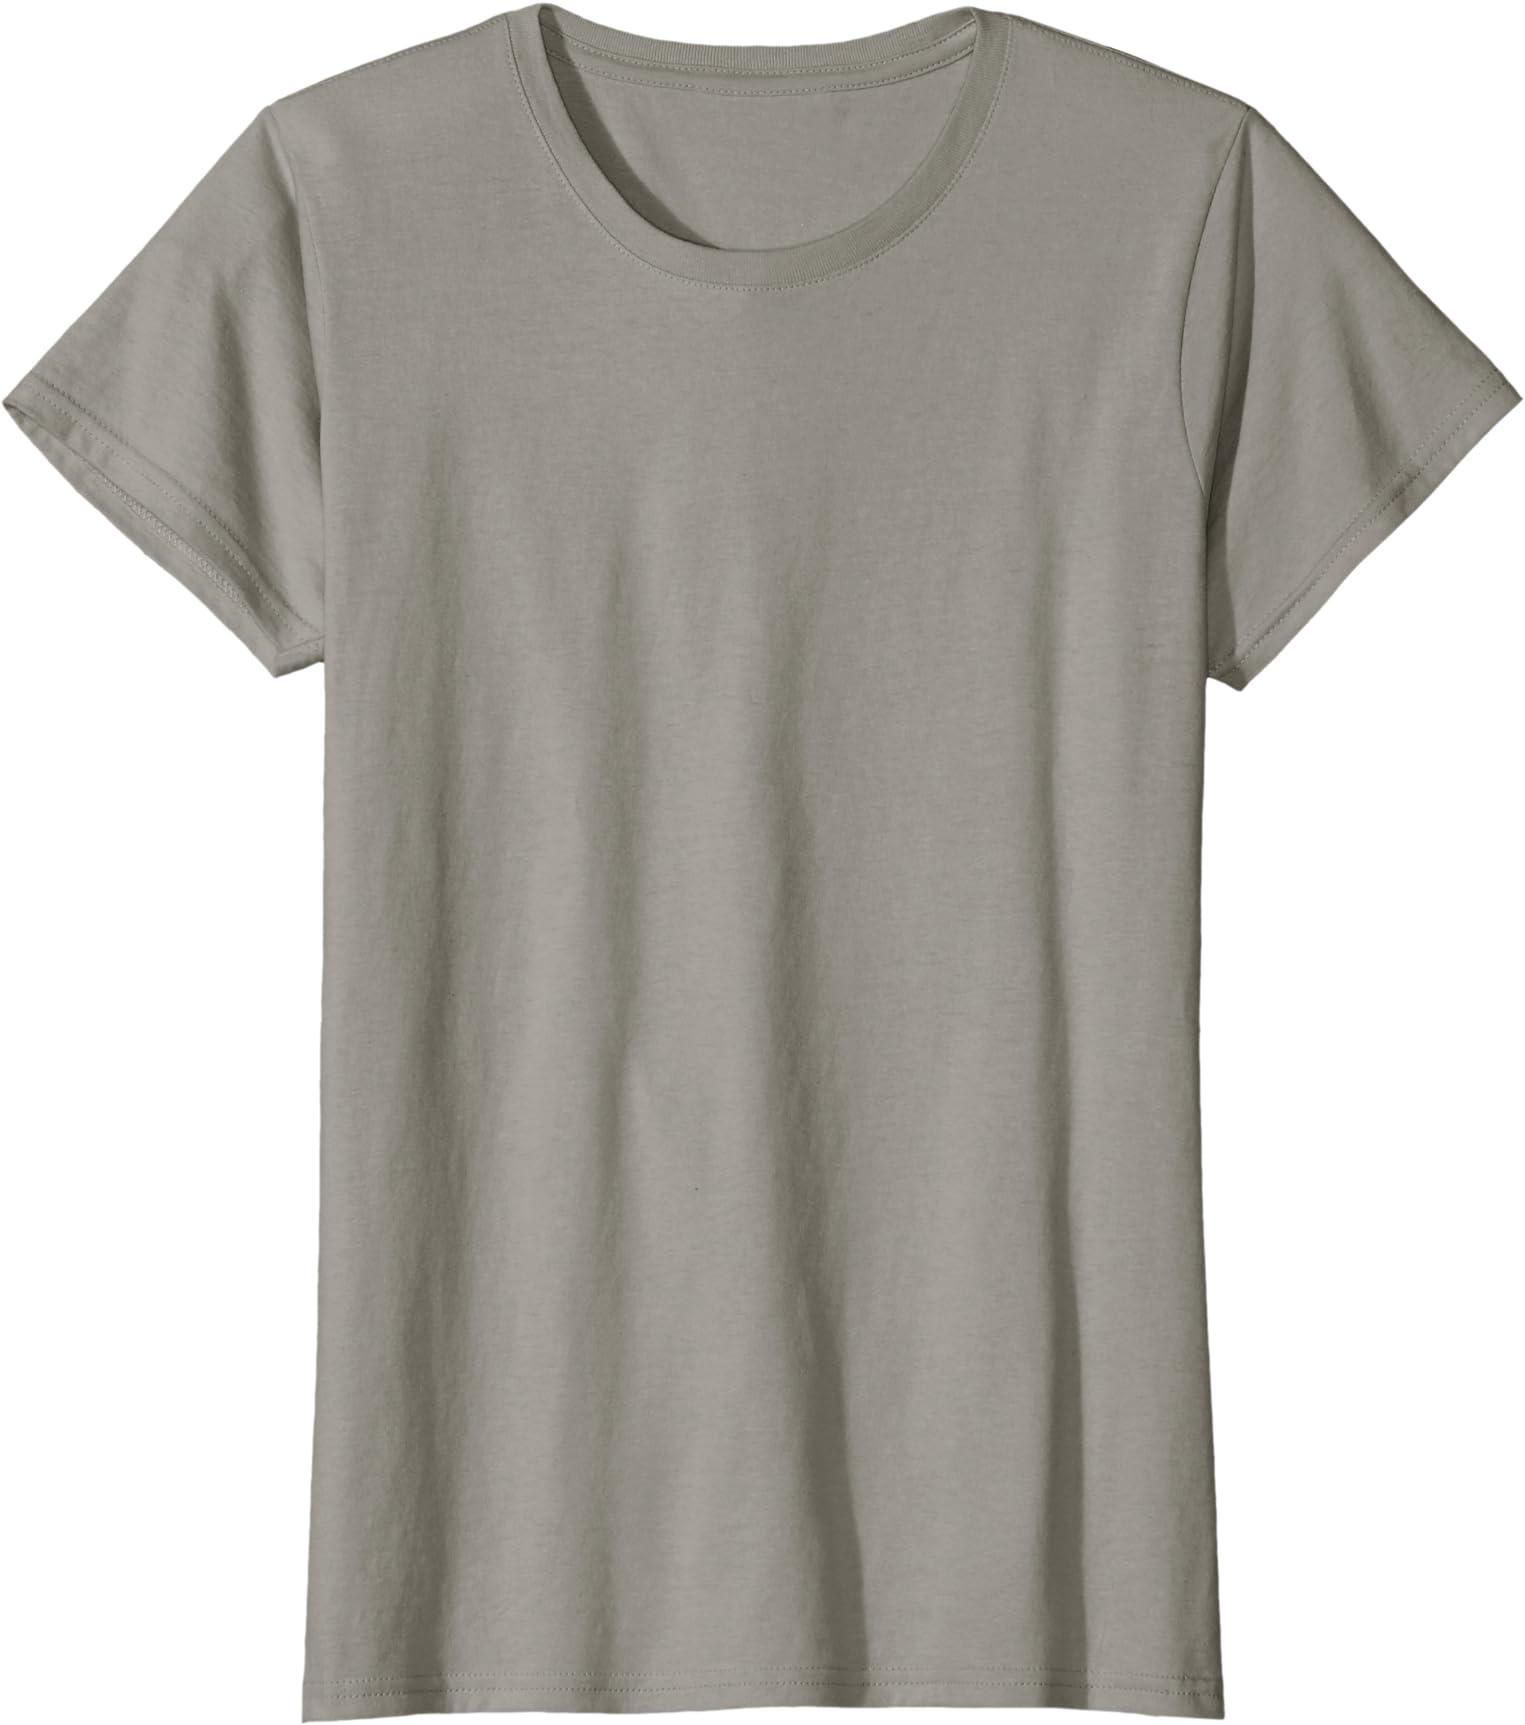 Women/'s Class Fit T-SHIRTS Minnesota home state T-shirts